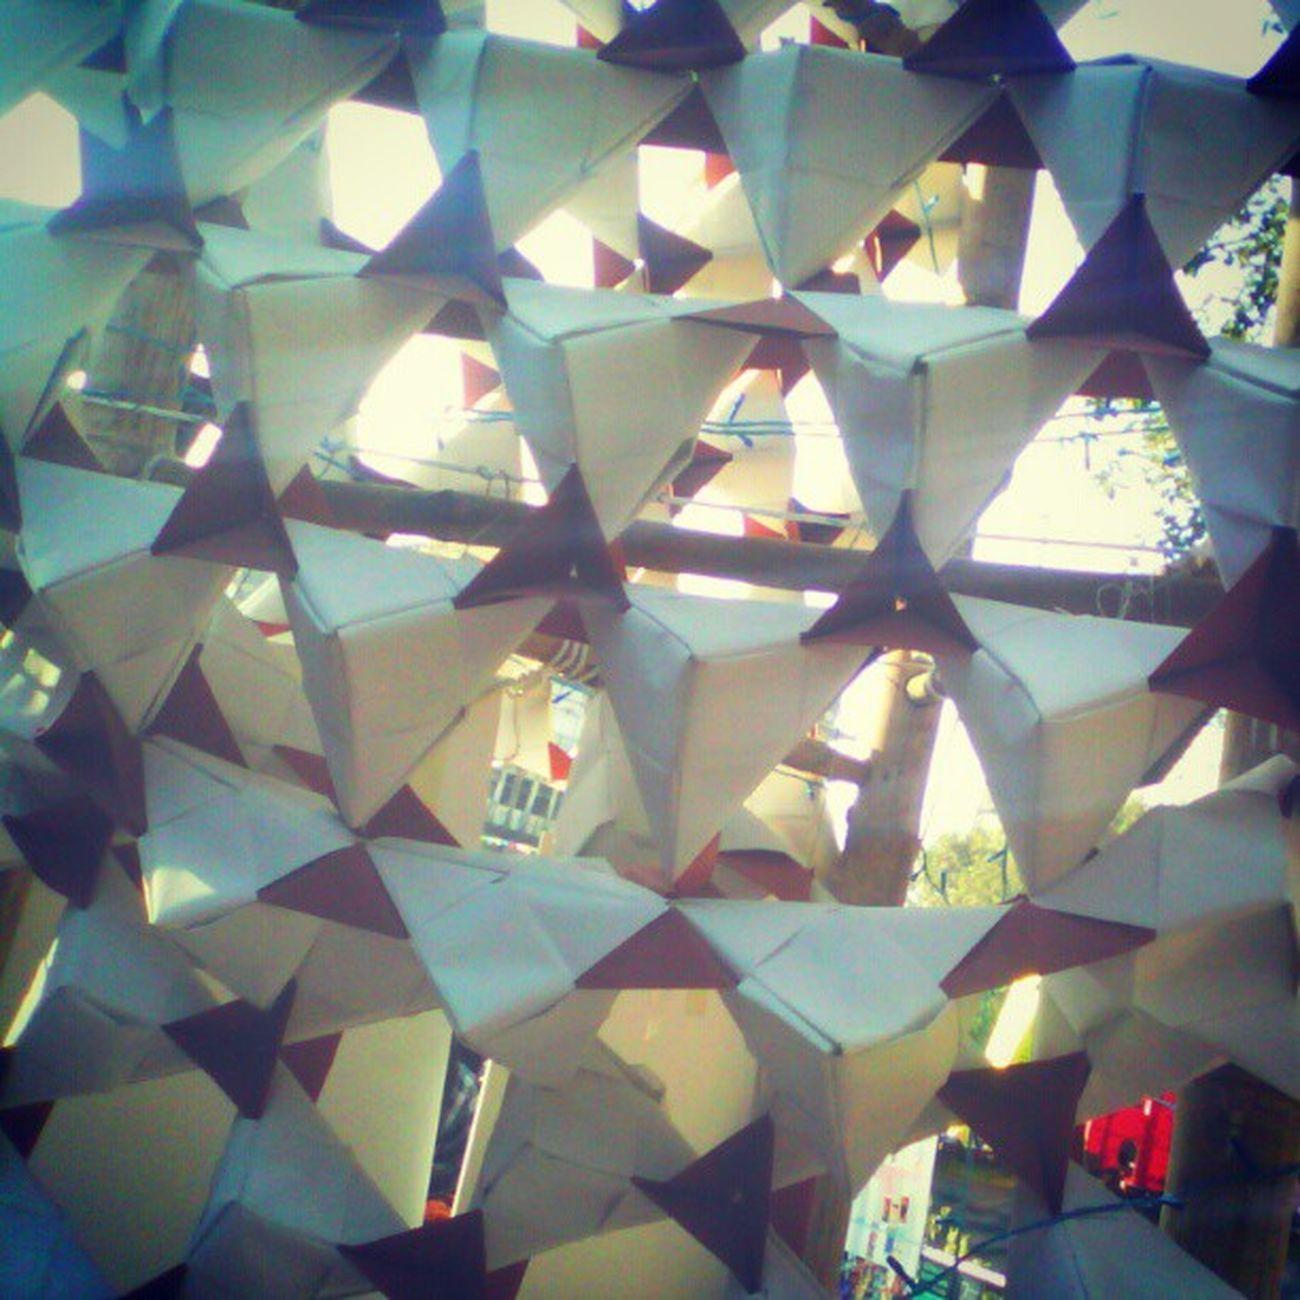 Instamumbai Instaaddicts Origami Picoftheday Photooftheday Ig